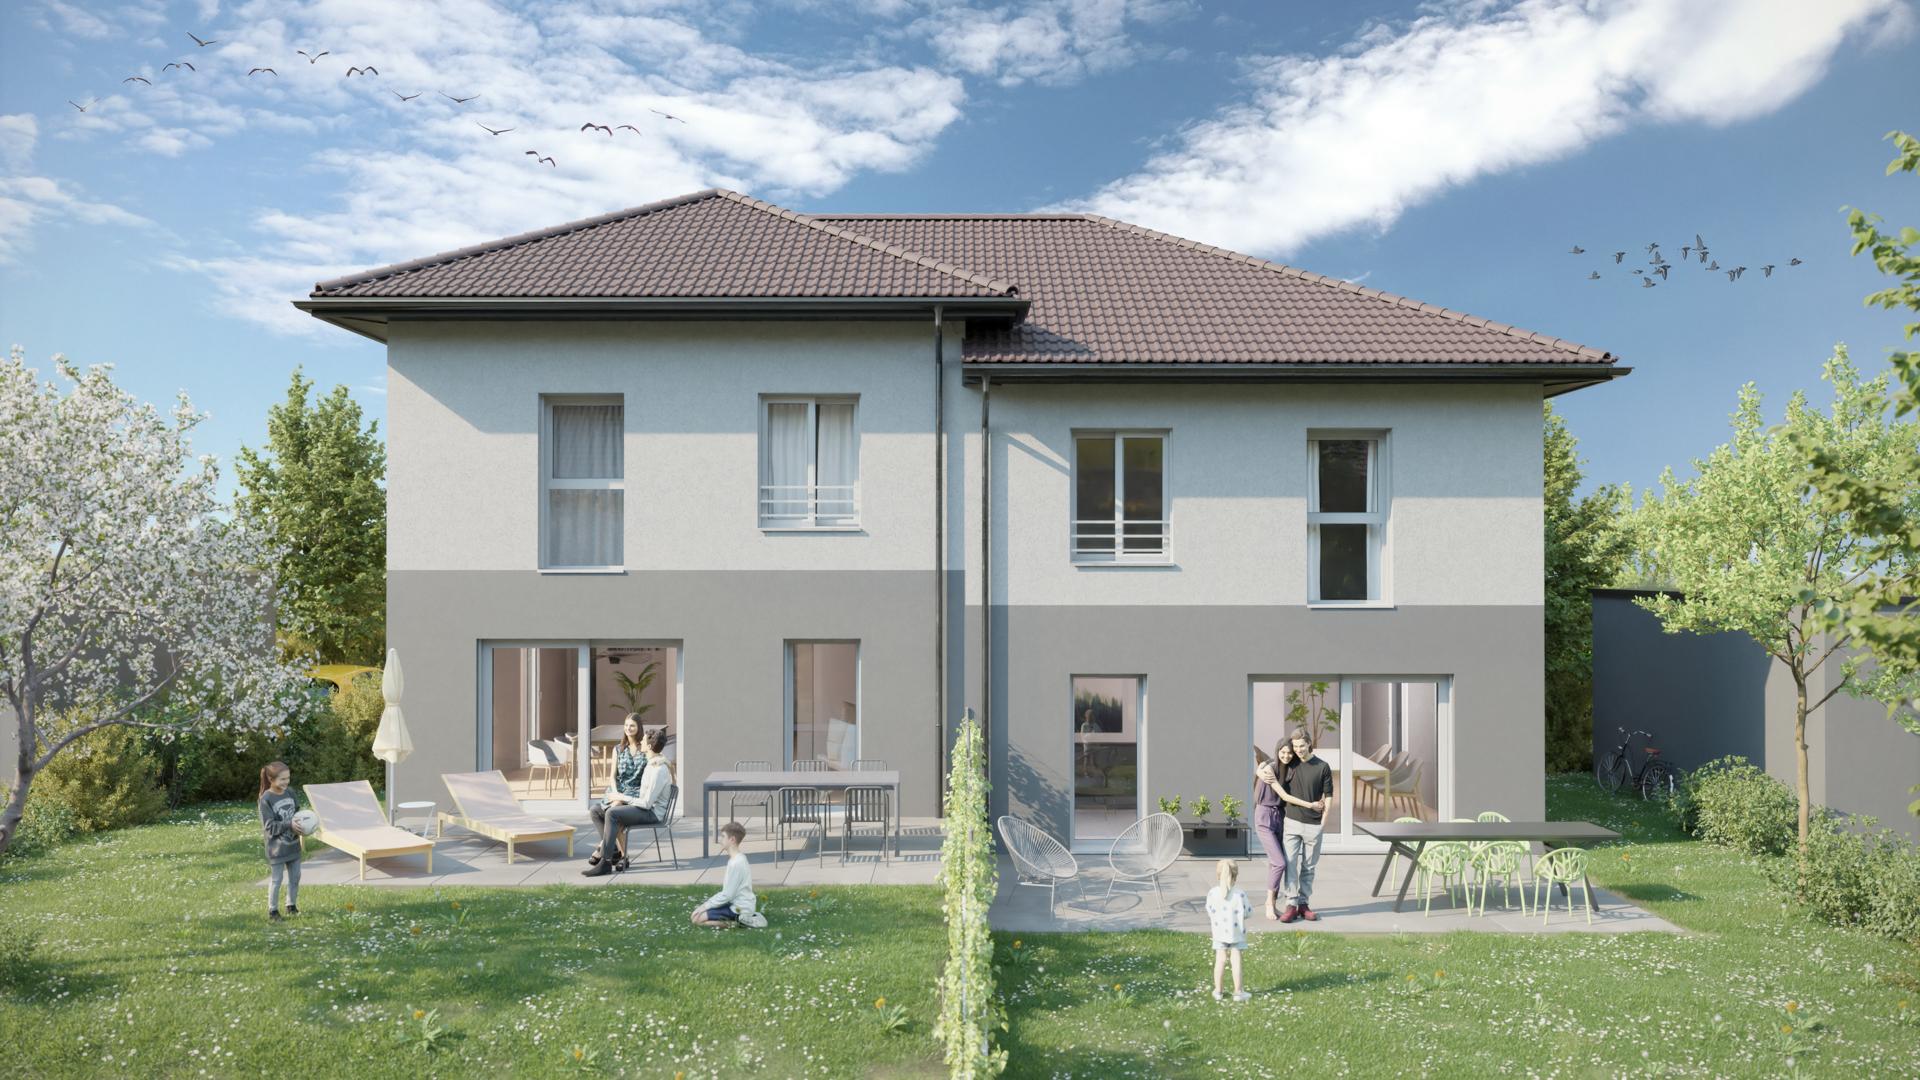 Vente Maison de 5 pièces 100 m² - VOUVRAY 01200 | IMOGROUP CHATILLON EN MICHAILLE - IMOGROUP photo2